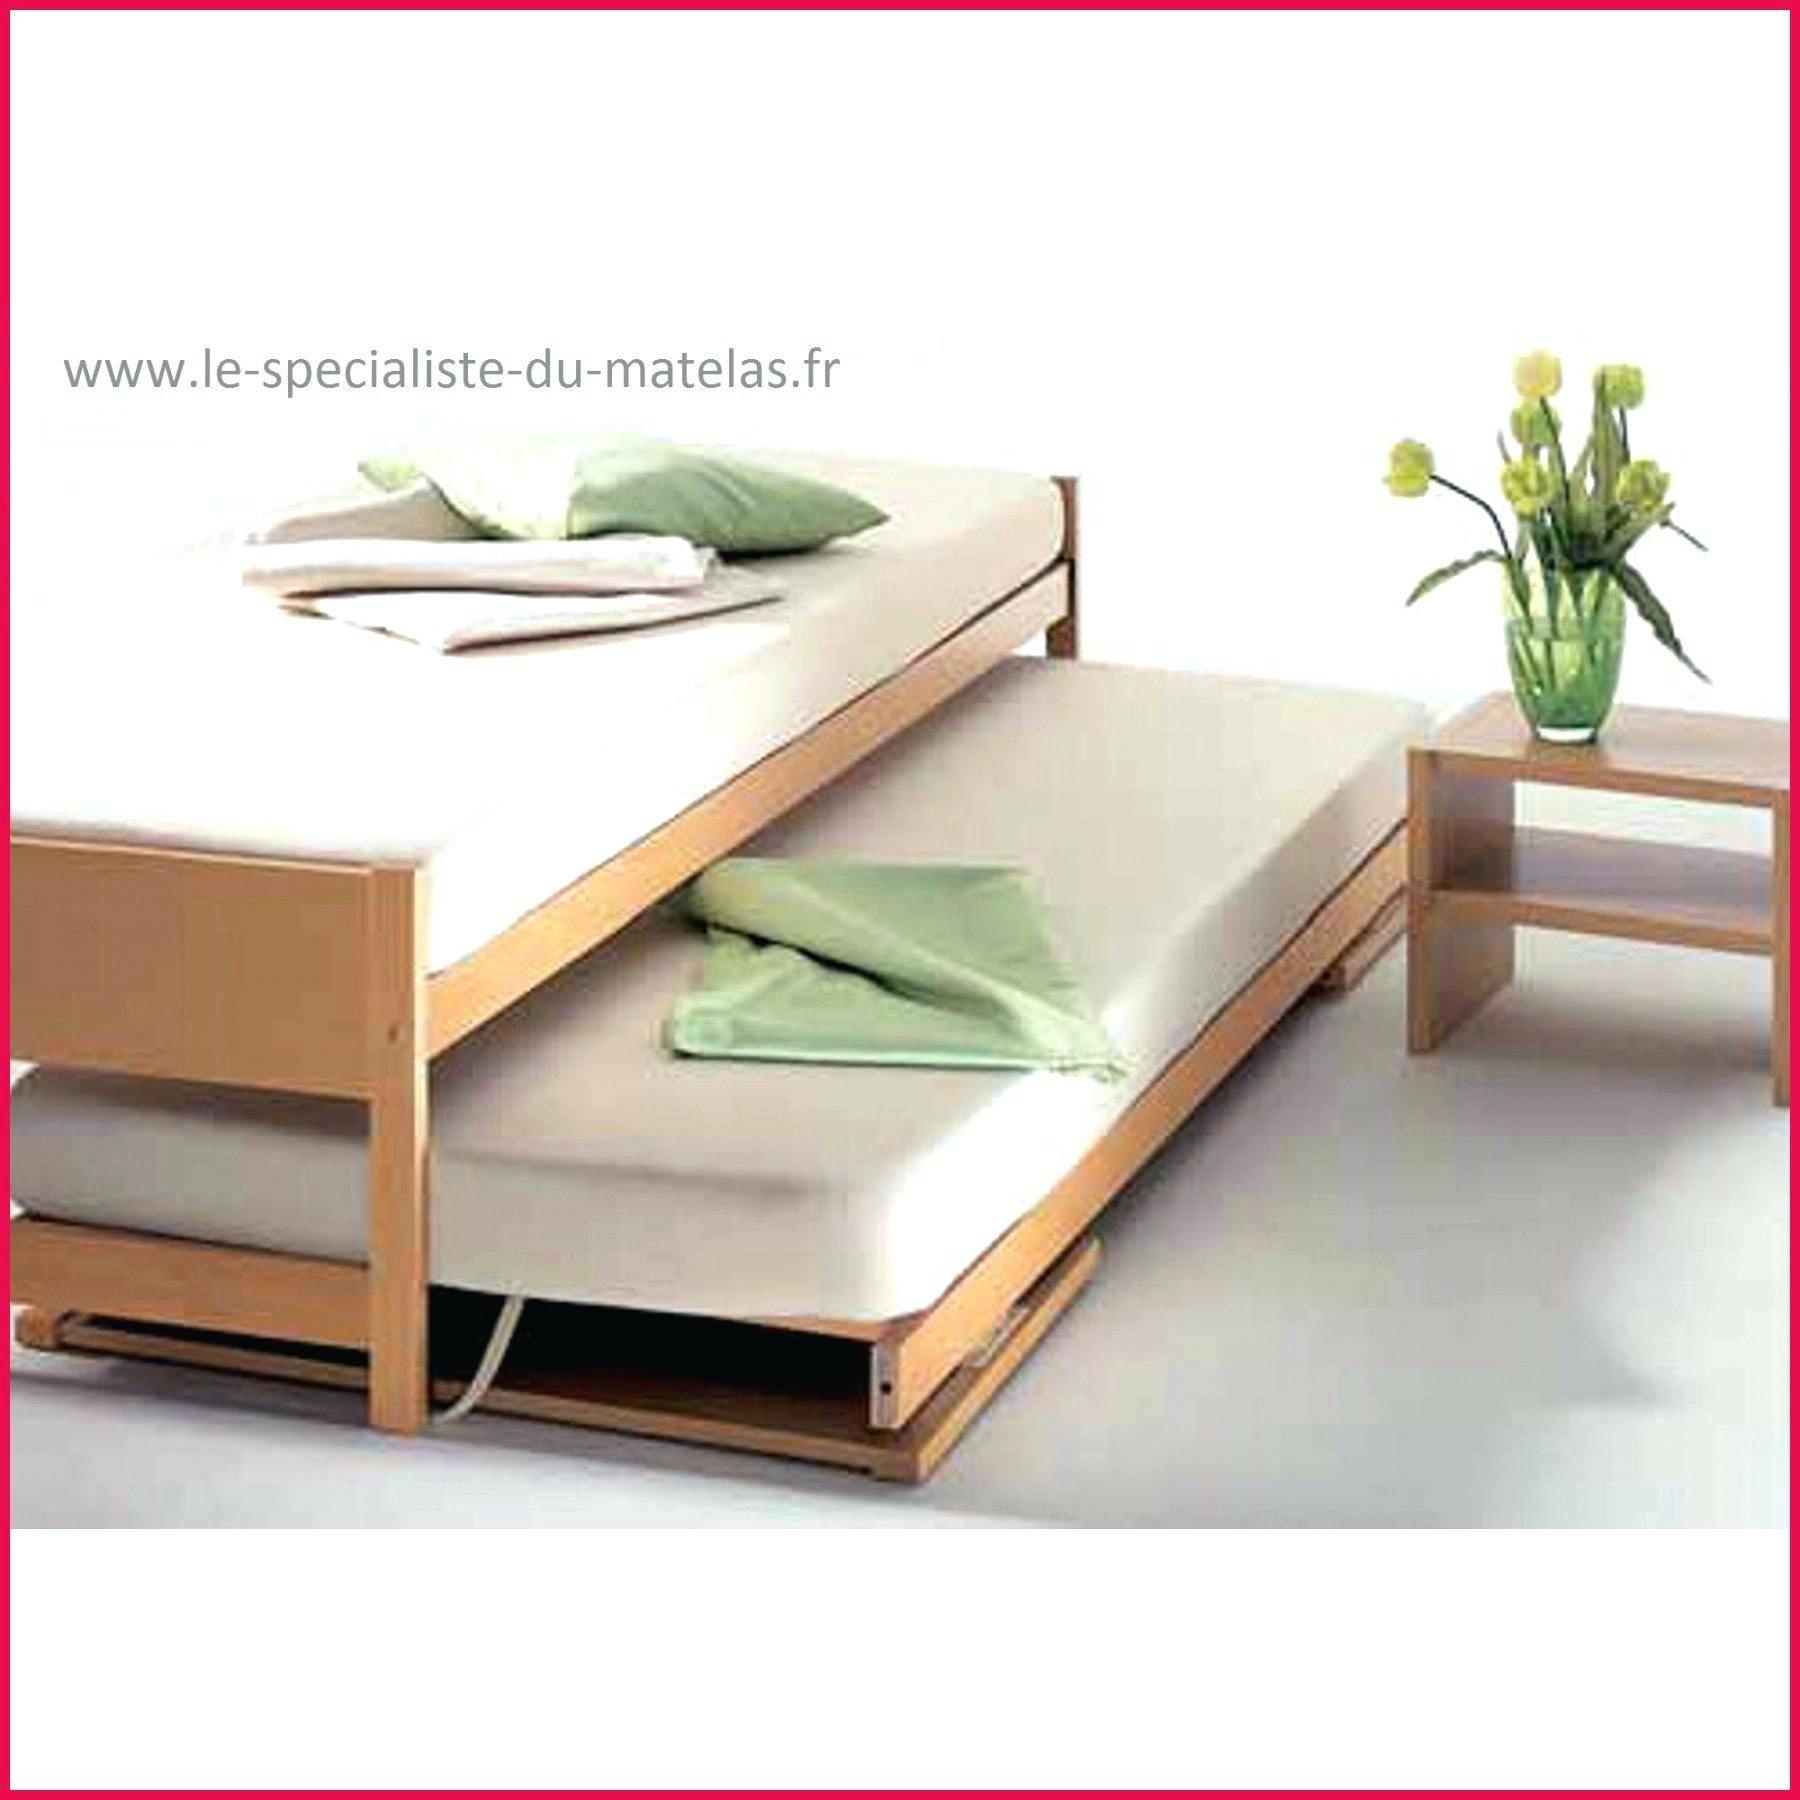 Banquette Gigogne Ikea Inspirant Galerie √ Lits Gigognes Adultes Adorable Lit Gigogne Adulte Meilleur De